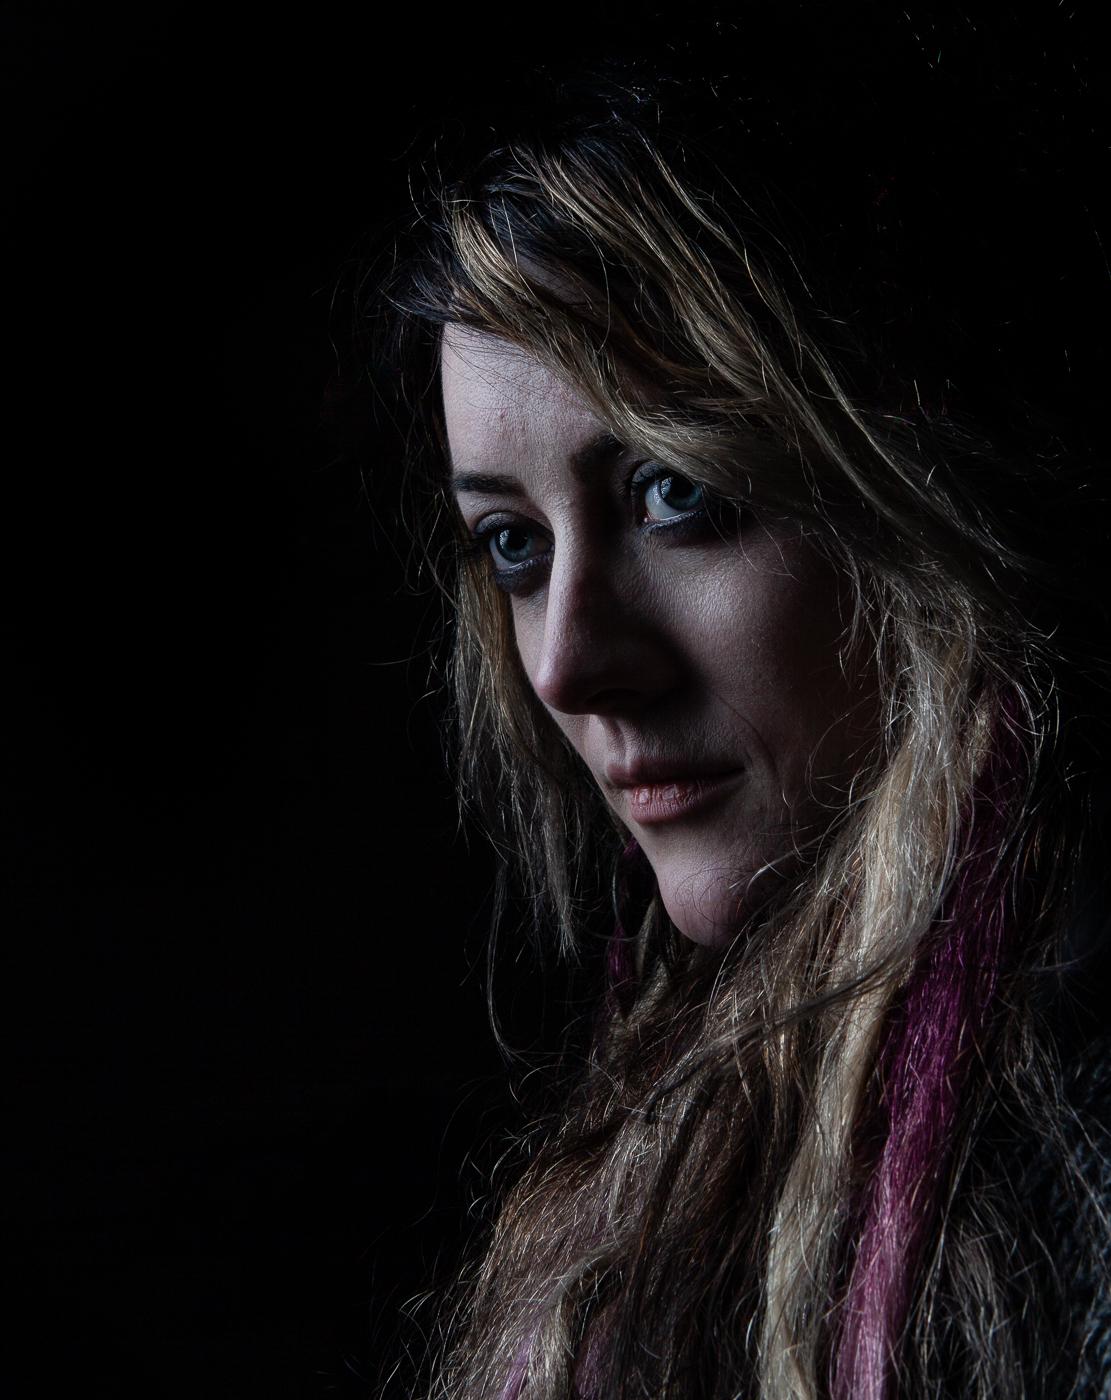 portraits-13 | mikepillowsphoto